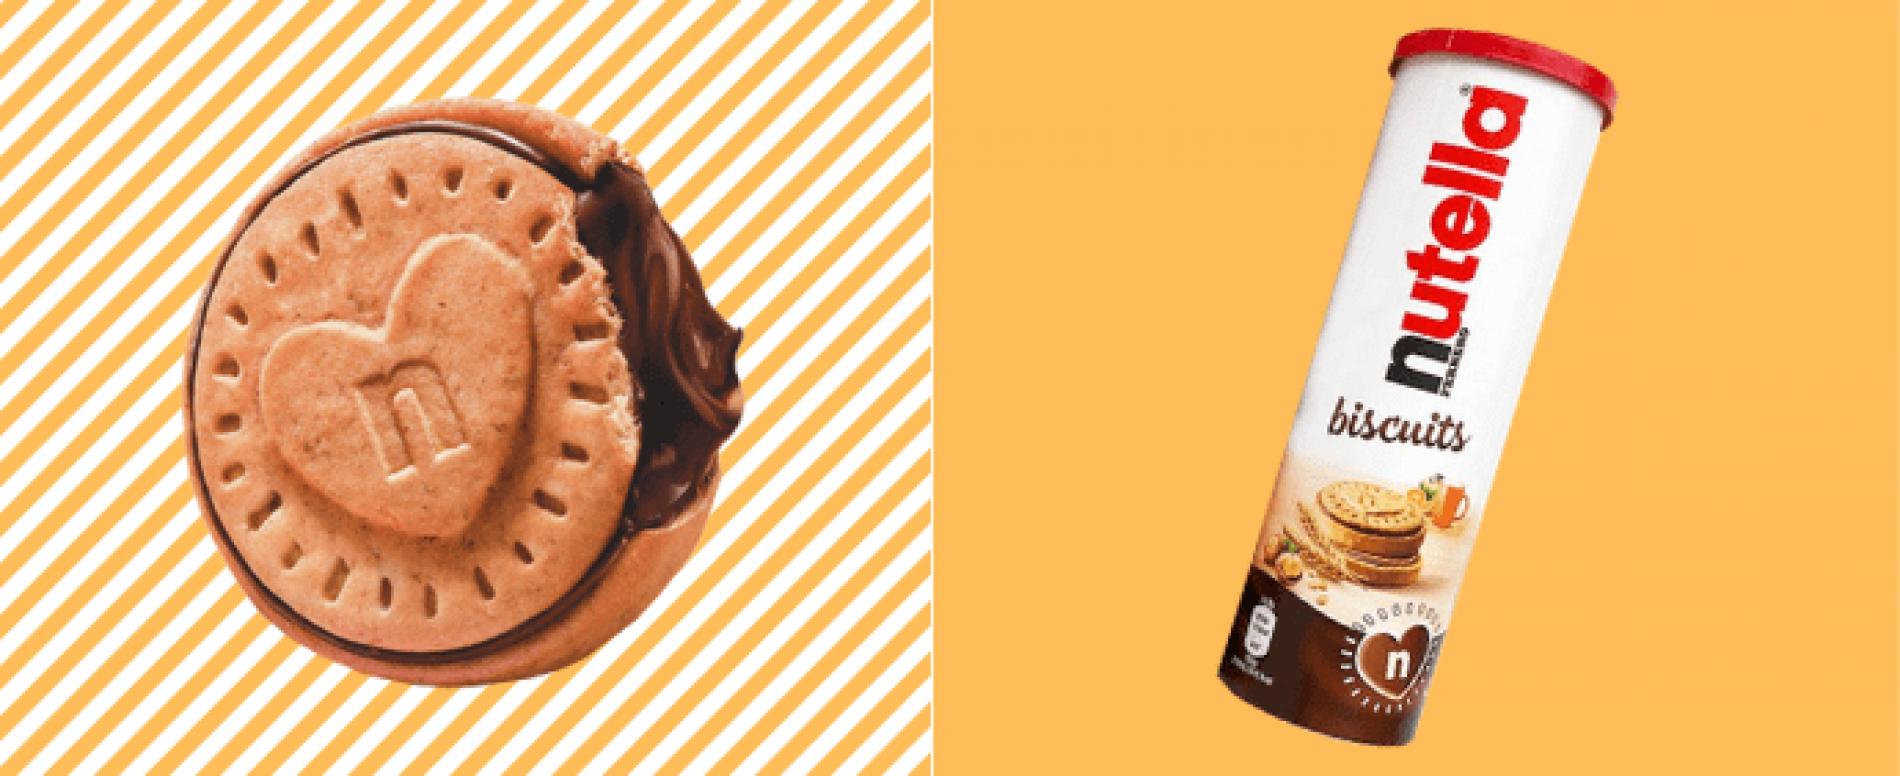 Ferrero lancia in Francia i Nutella Biscuits